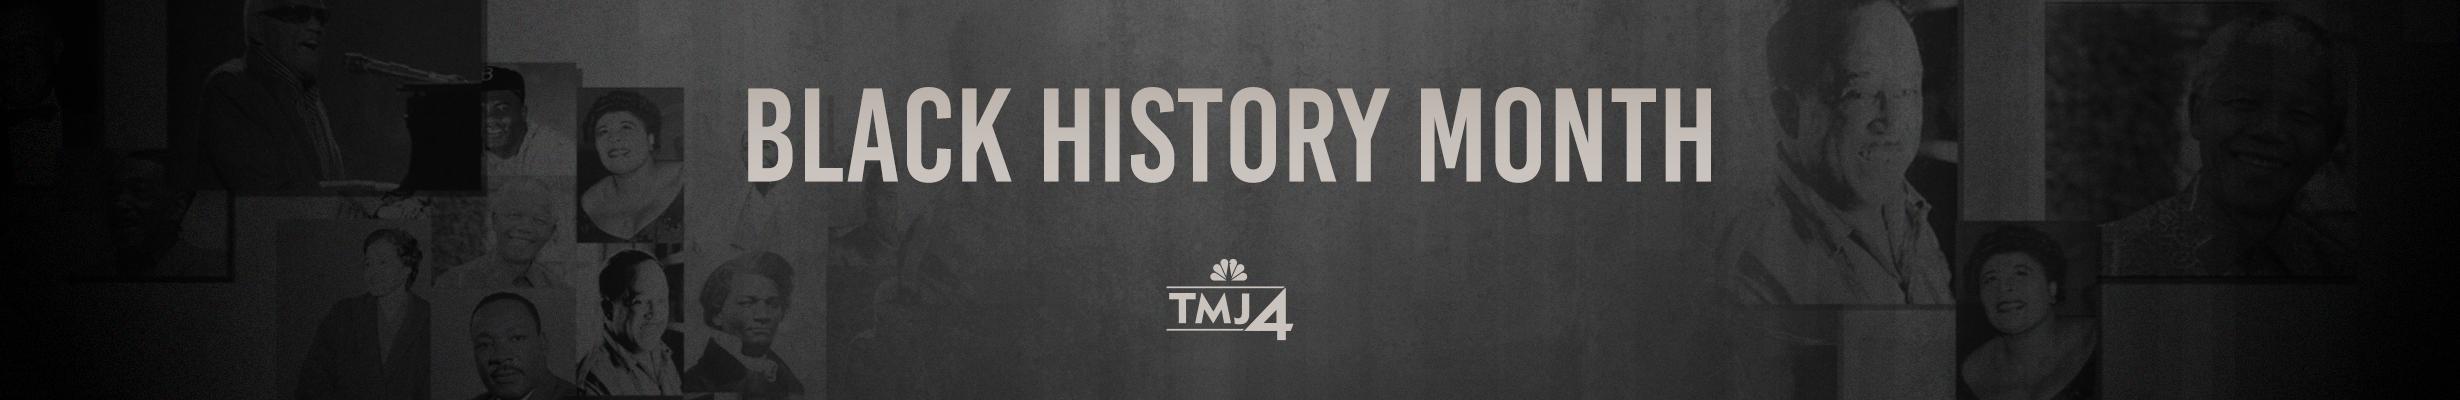 Black History Month Web Banner.png